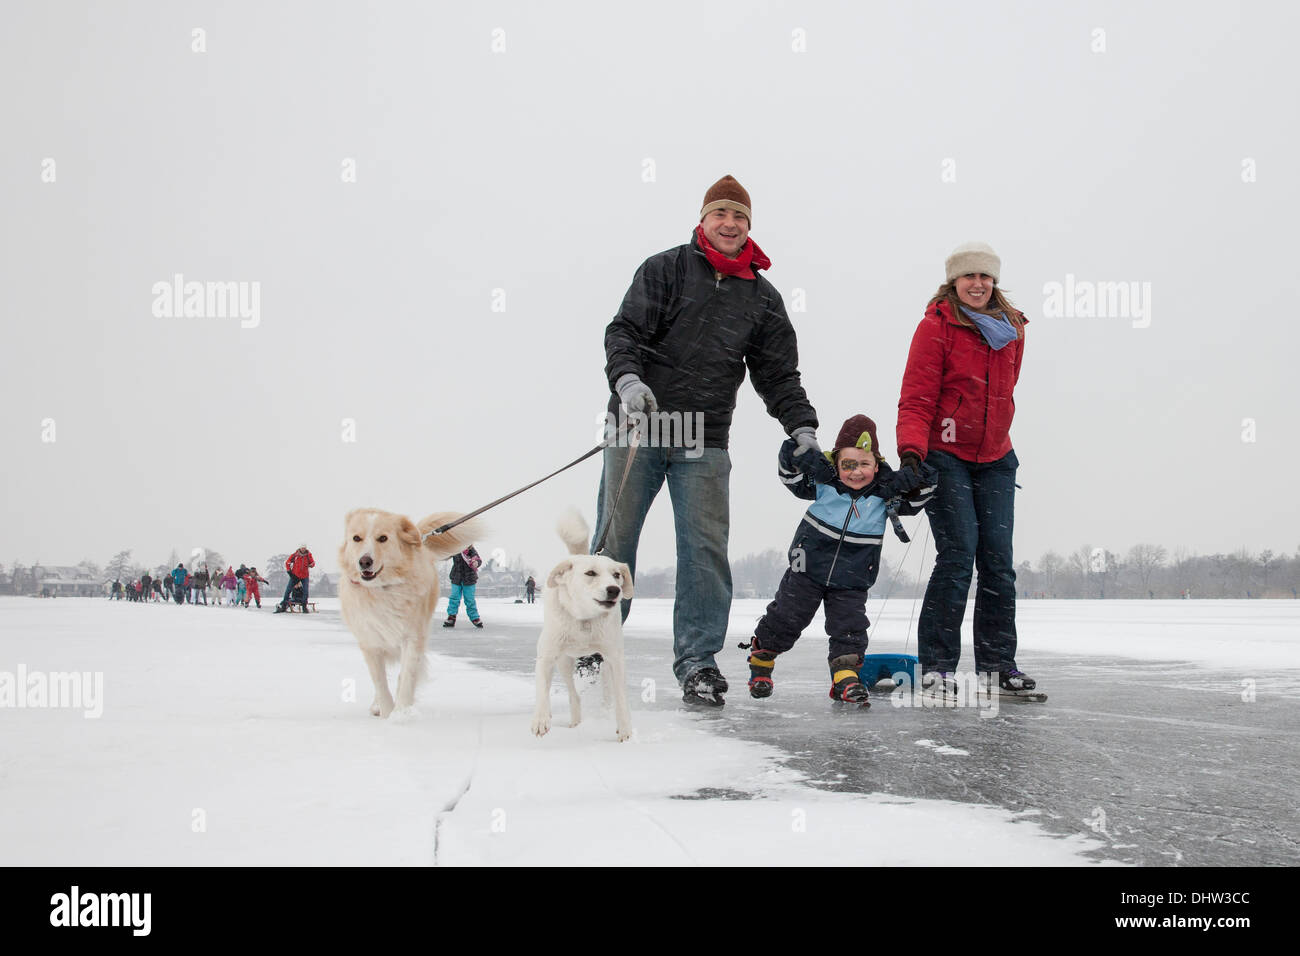 Netherlands, Loosdrecht, Lakes called Loosdrechtse Plassen. Winter. Family ice skating with dogs - Stock Image